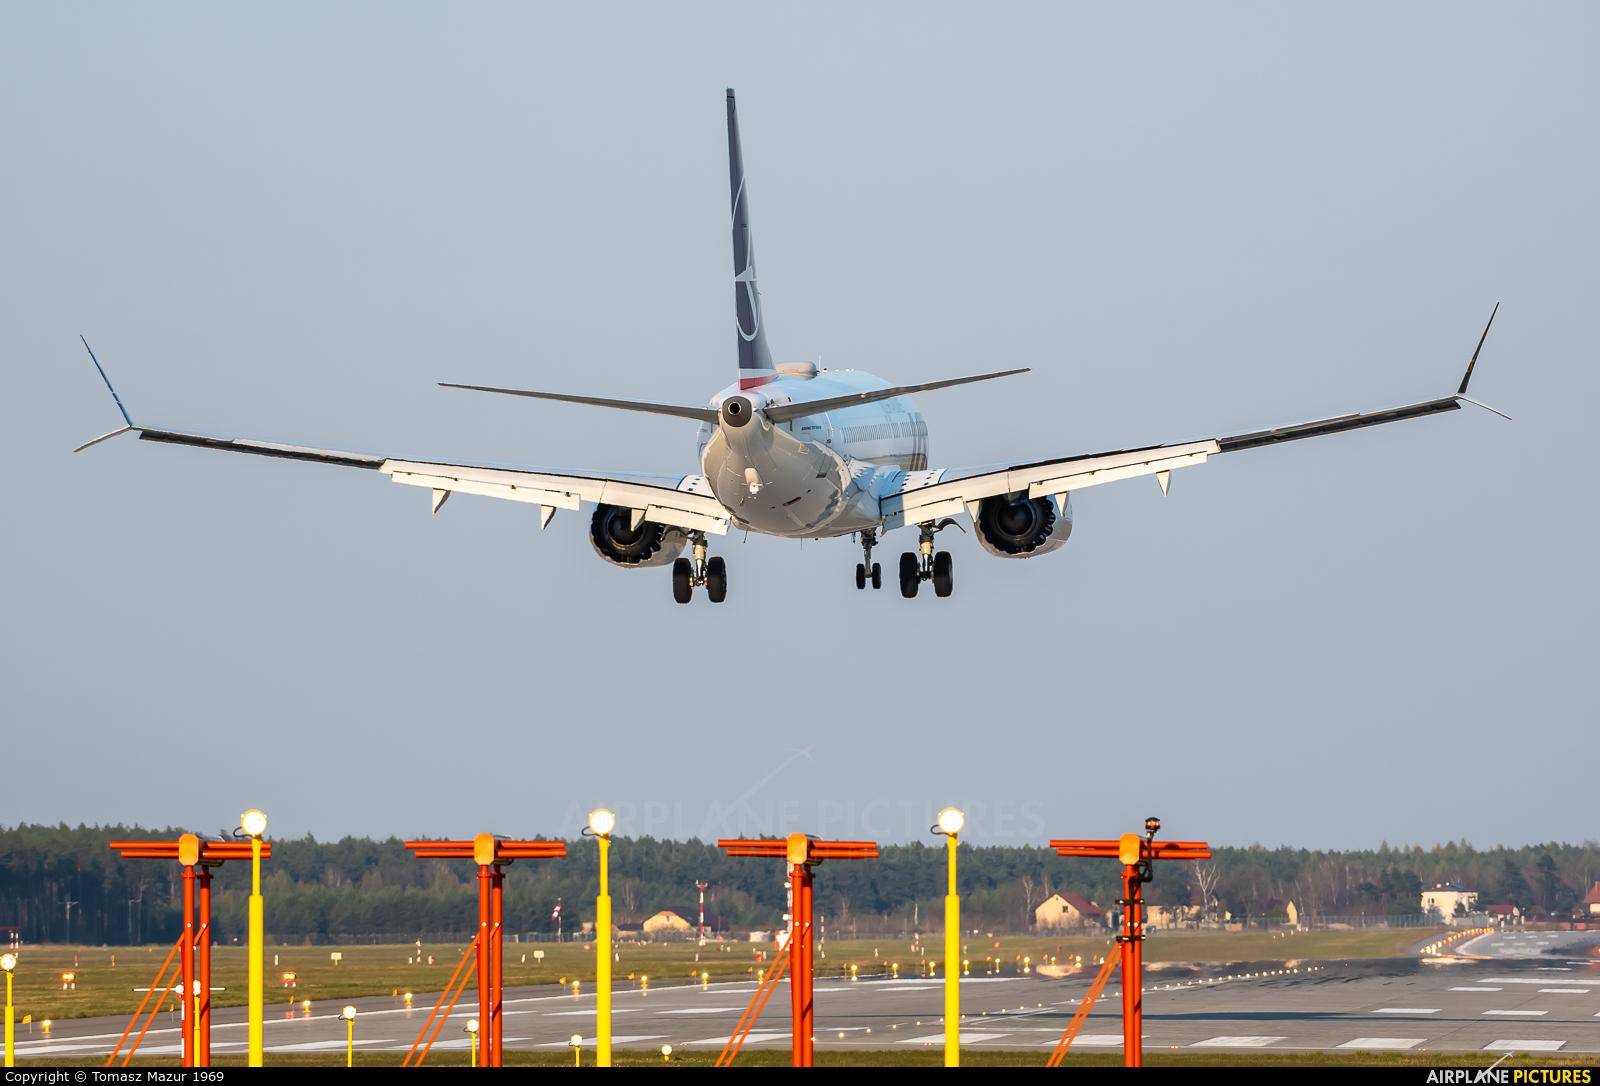 LOT - Polish Airlines SP-LVA aircraft at Katowice - Pyrzowice